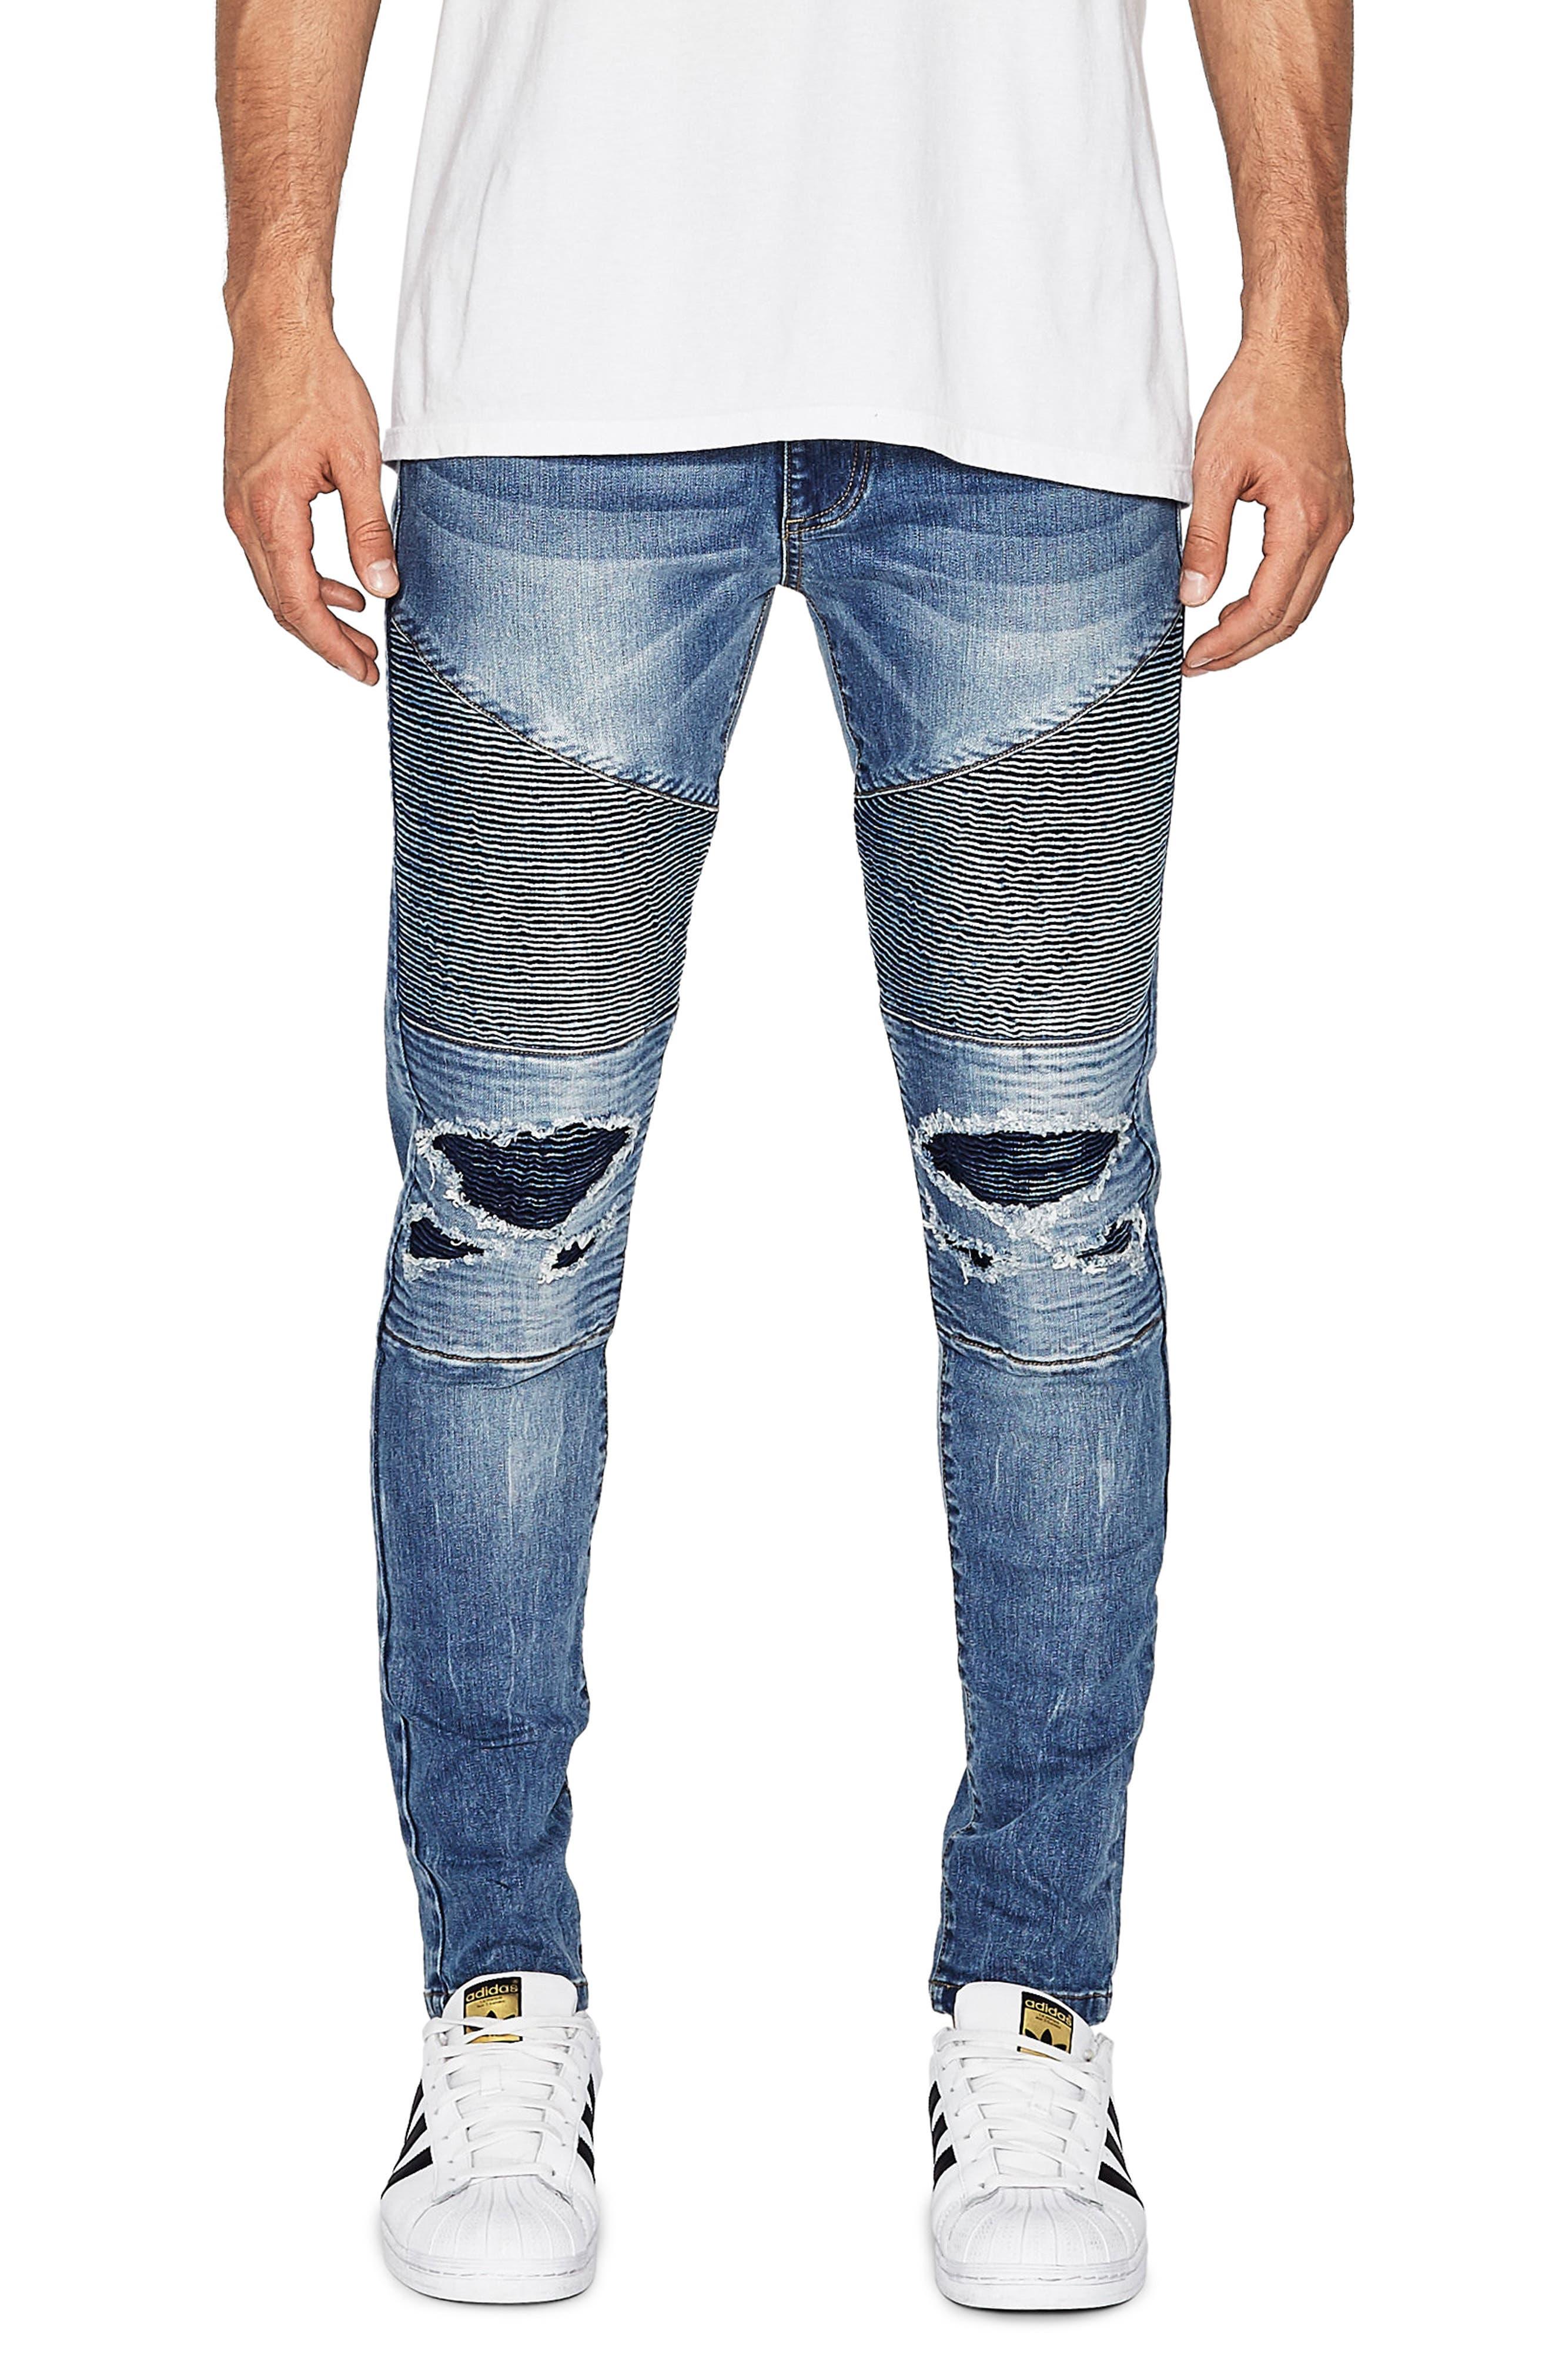 NXP Combination Moto Skinny Moto Jeans in Milwaukee Blue